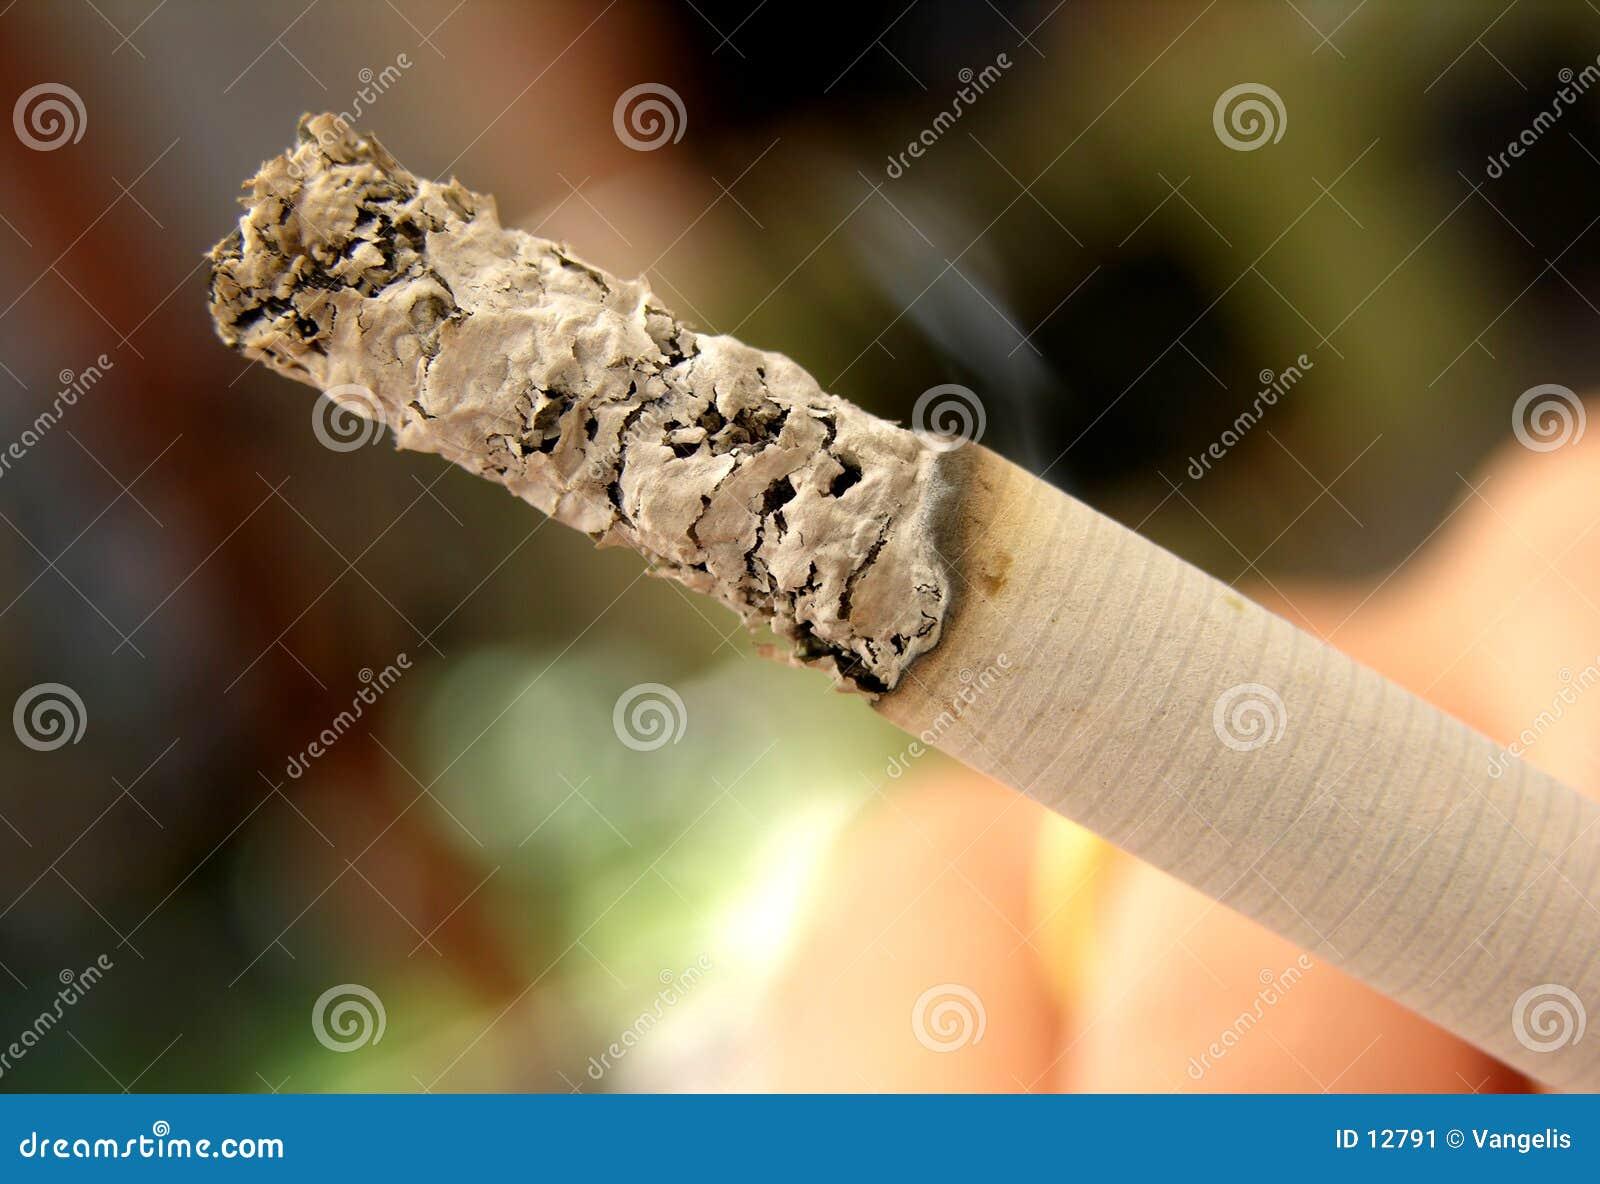 Zigarettenasche